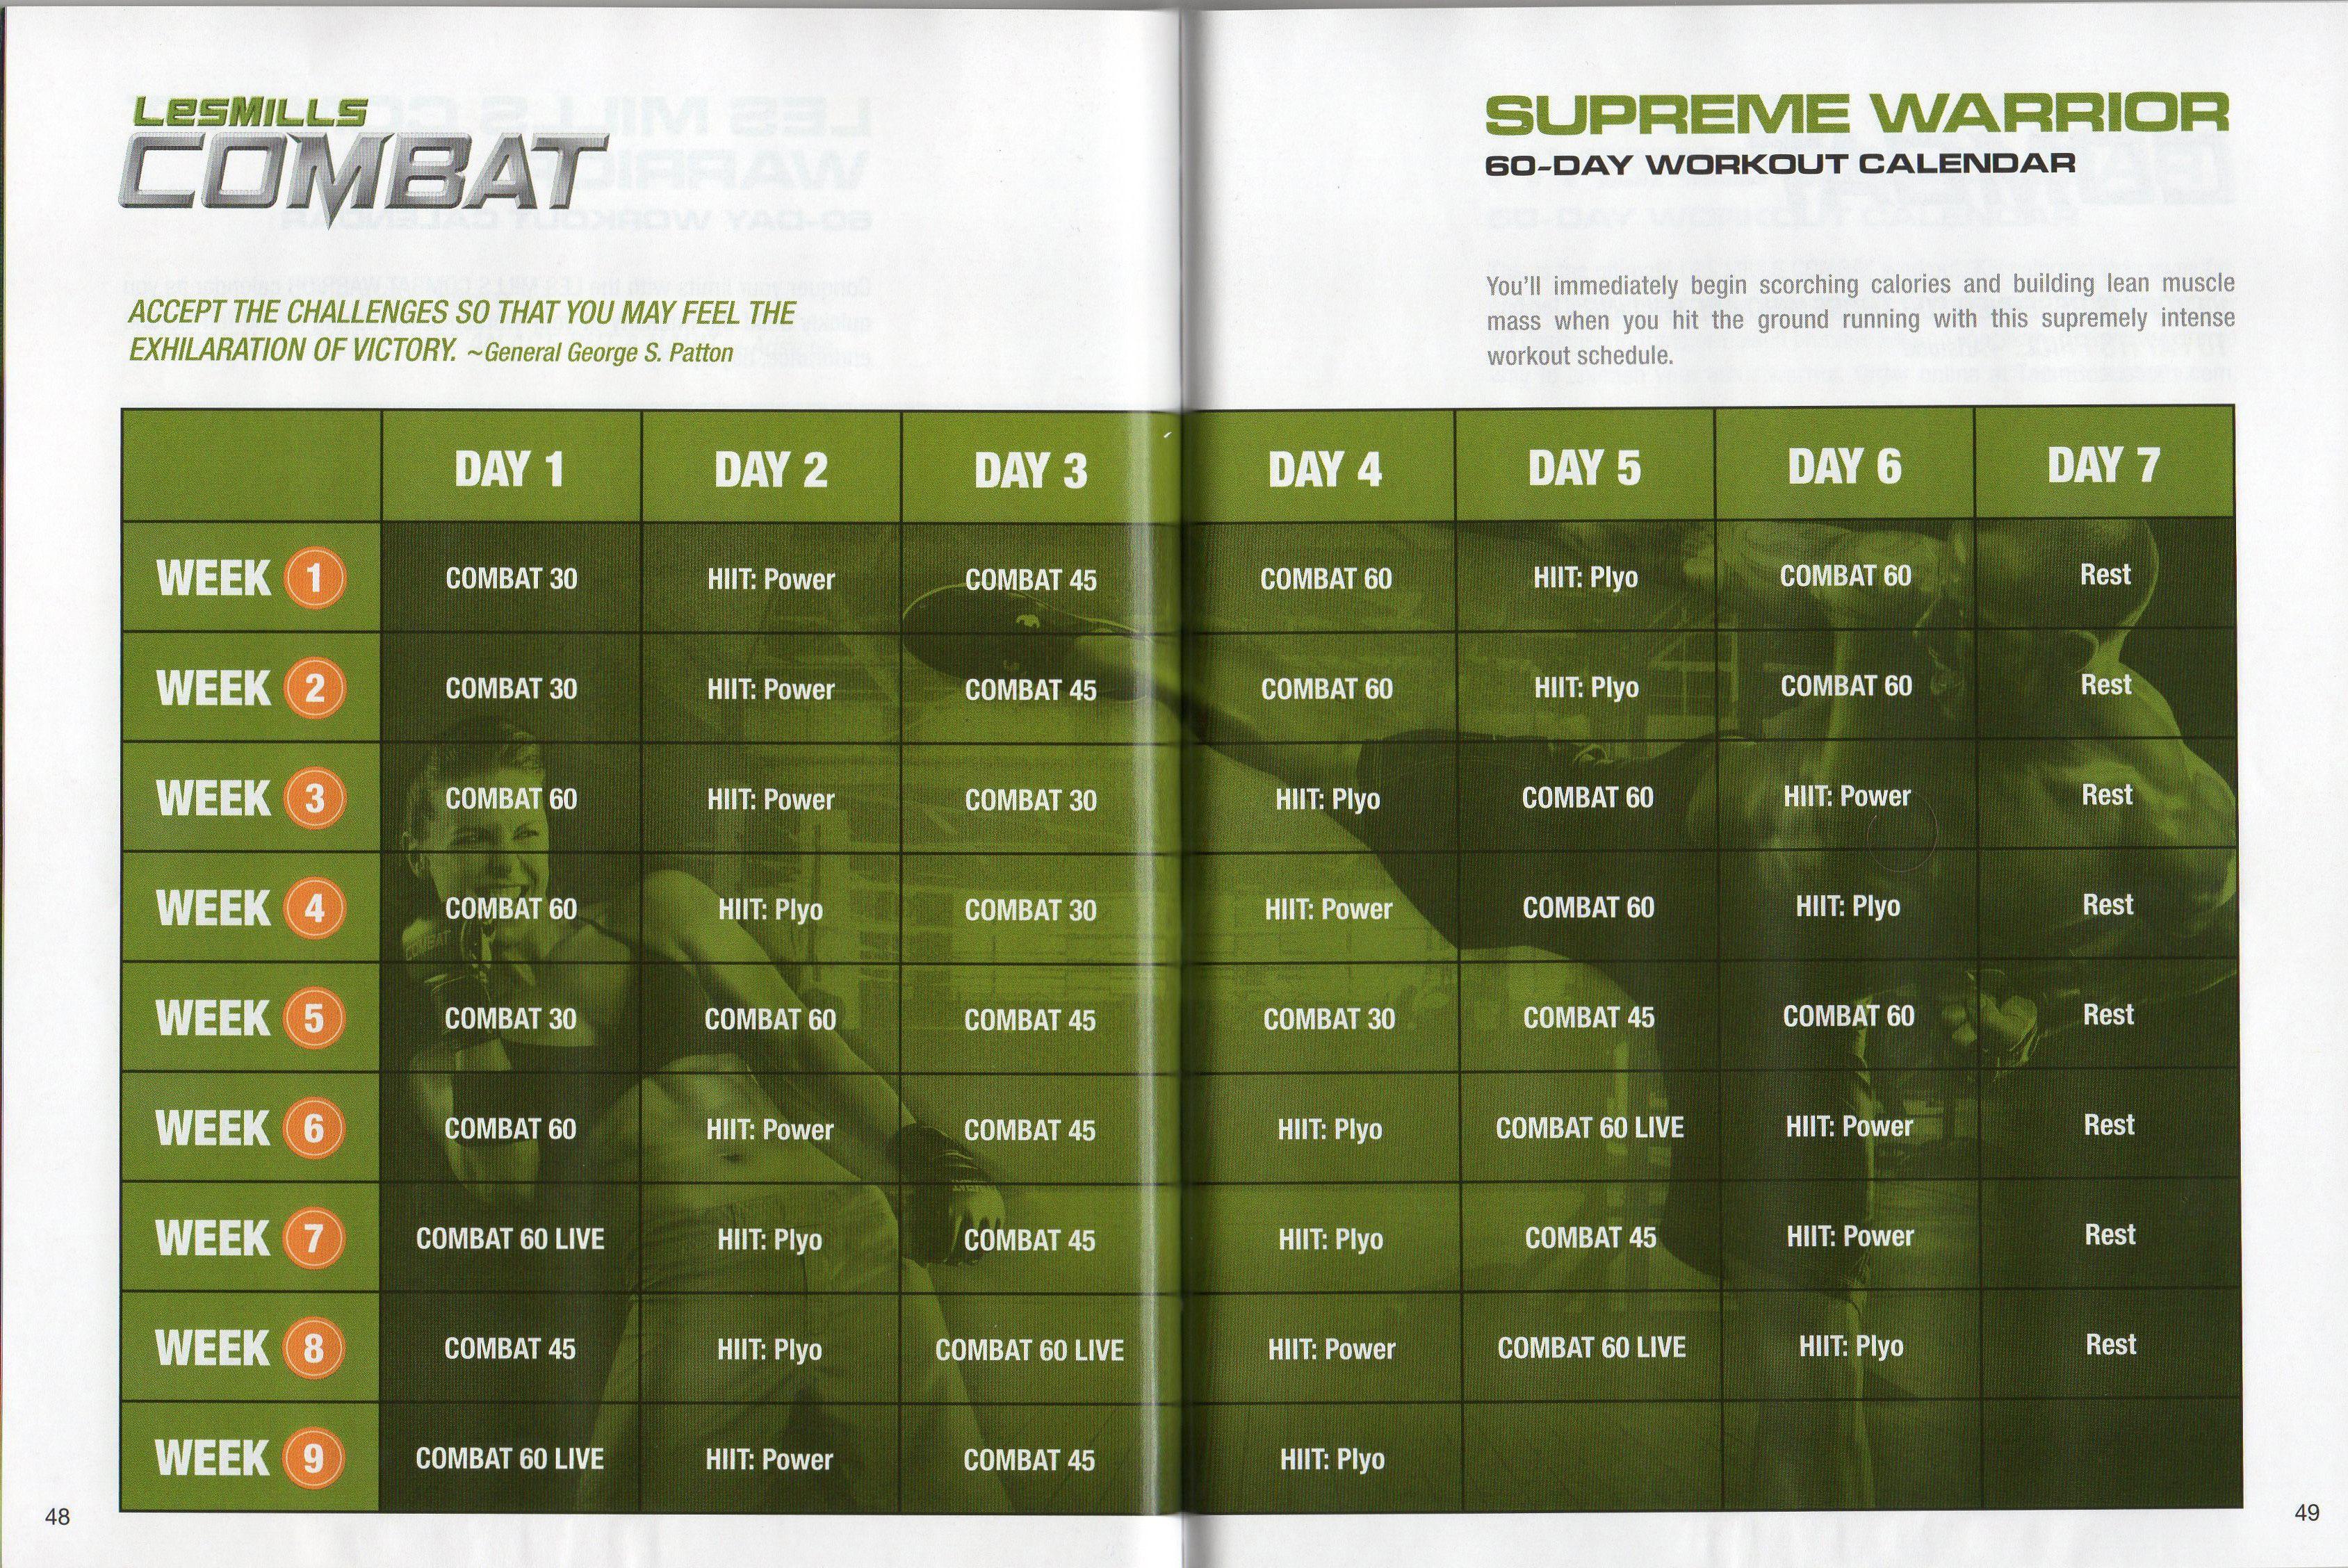 Les Mills Combat ~ 02 ~ 60 Day Supreme Warrior Calendar Regarding 90 Day Supreme Workout Calendar